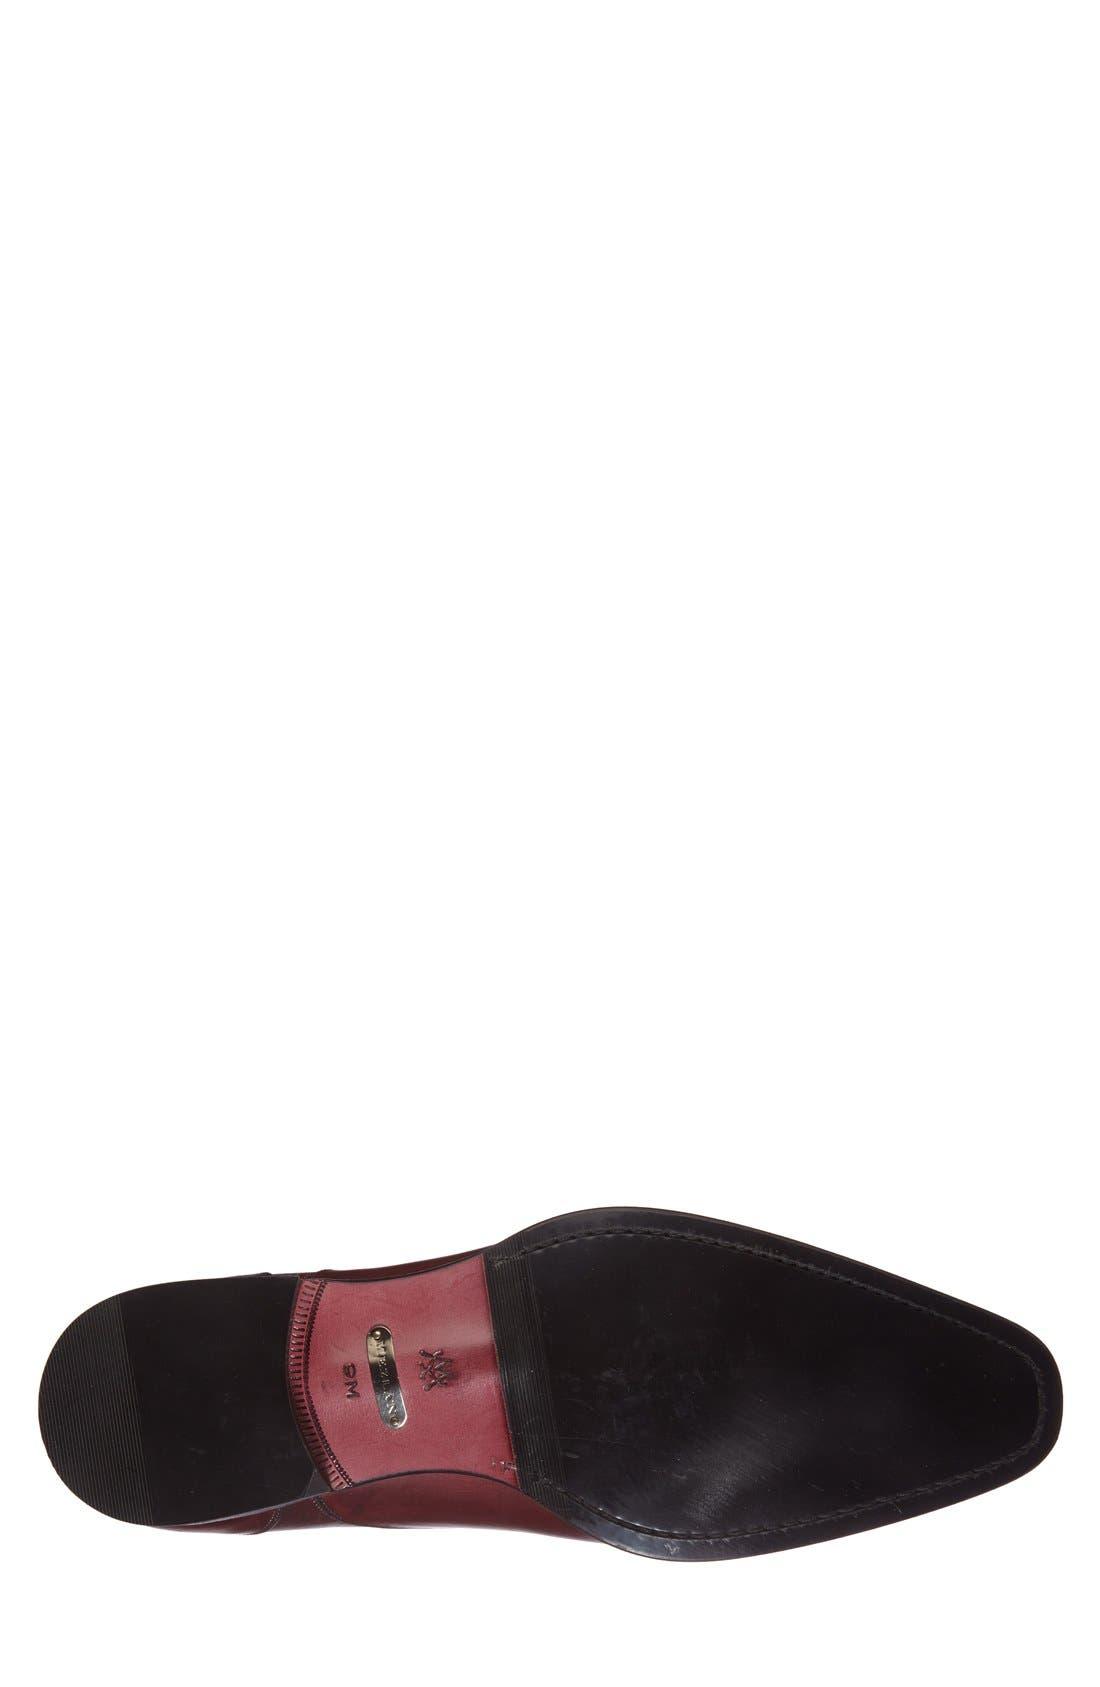 Alternate Image 2  - Mezlan 'Toulouse' Cap Toe Oxford (Men)